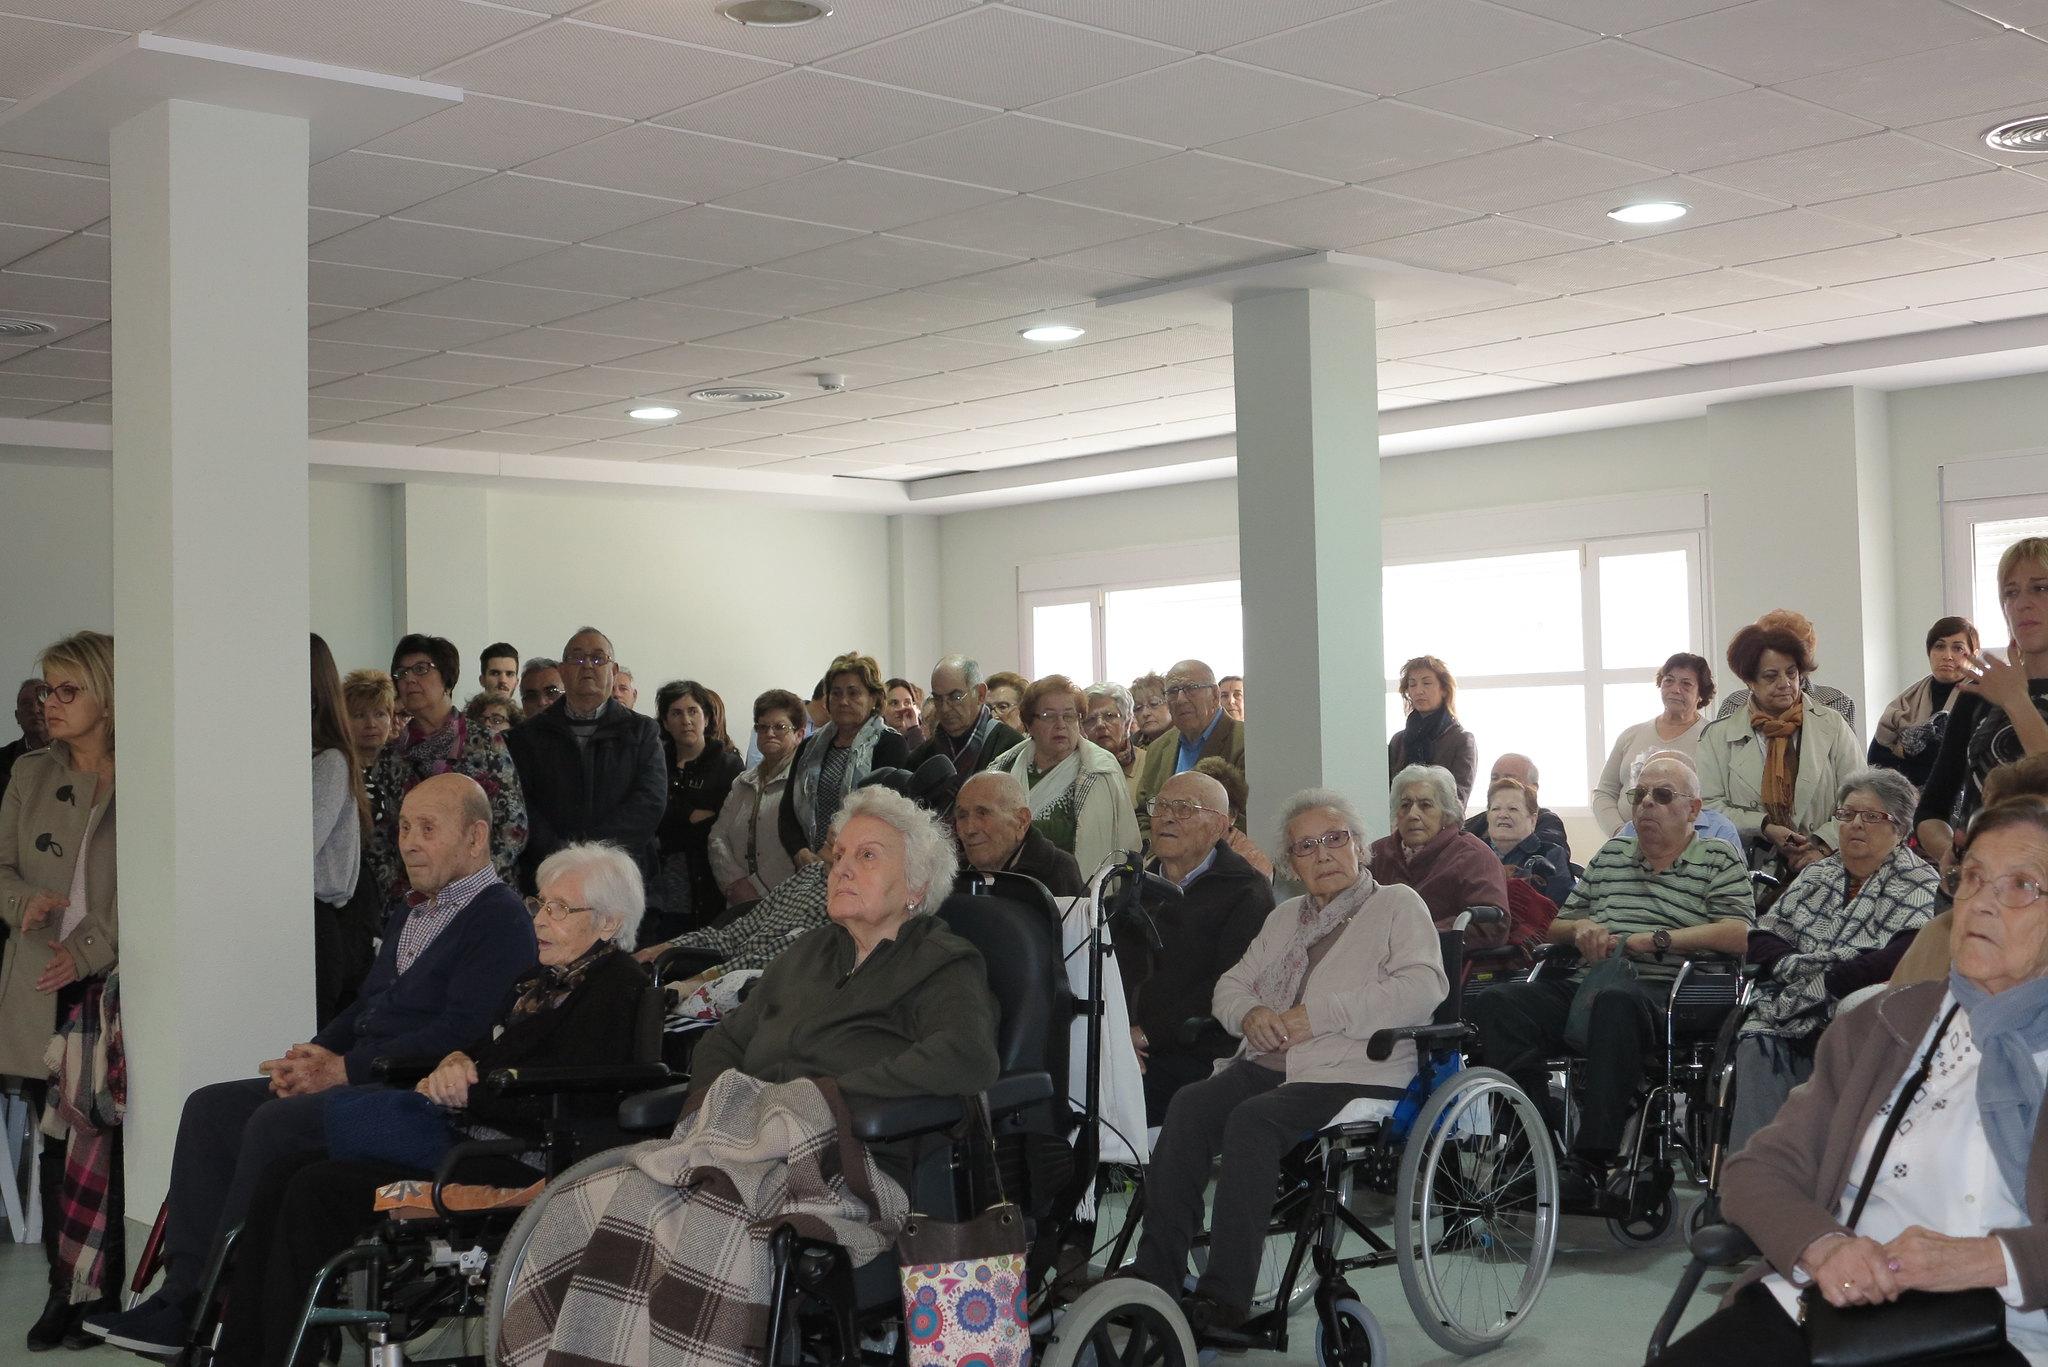 (2016-02-13) - Inauguración Virgen de Lourdes, La Molineta - Archivo La Molineta 2 (04)